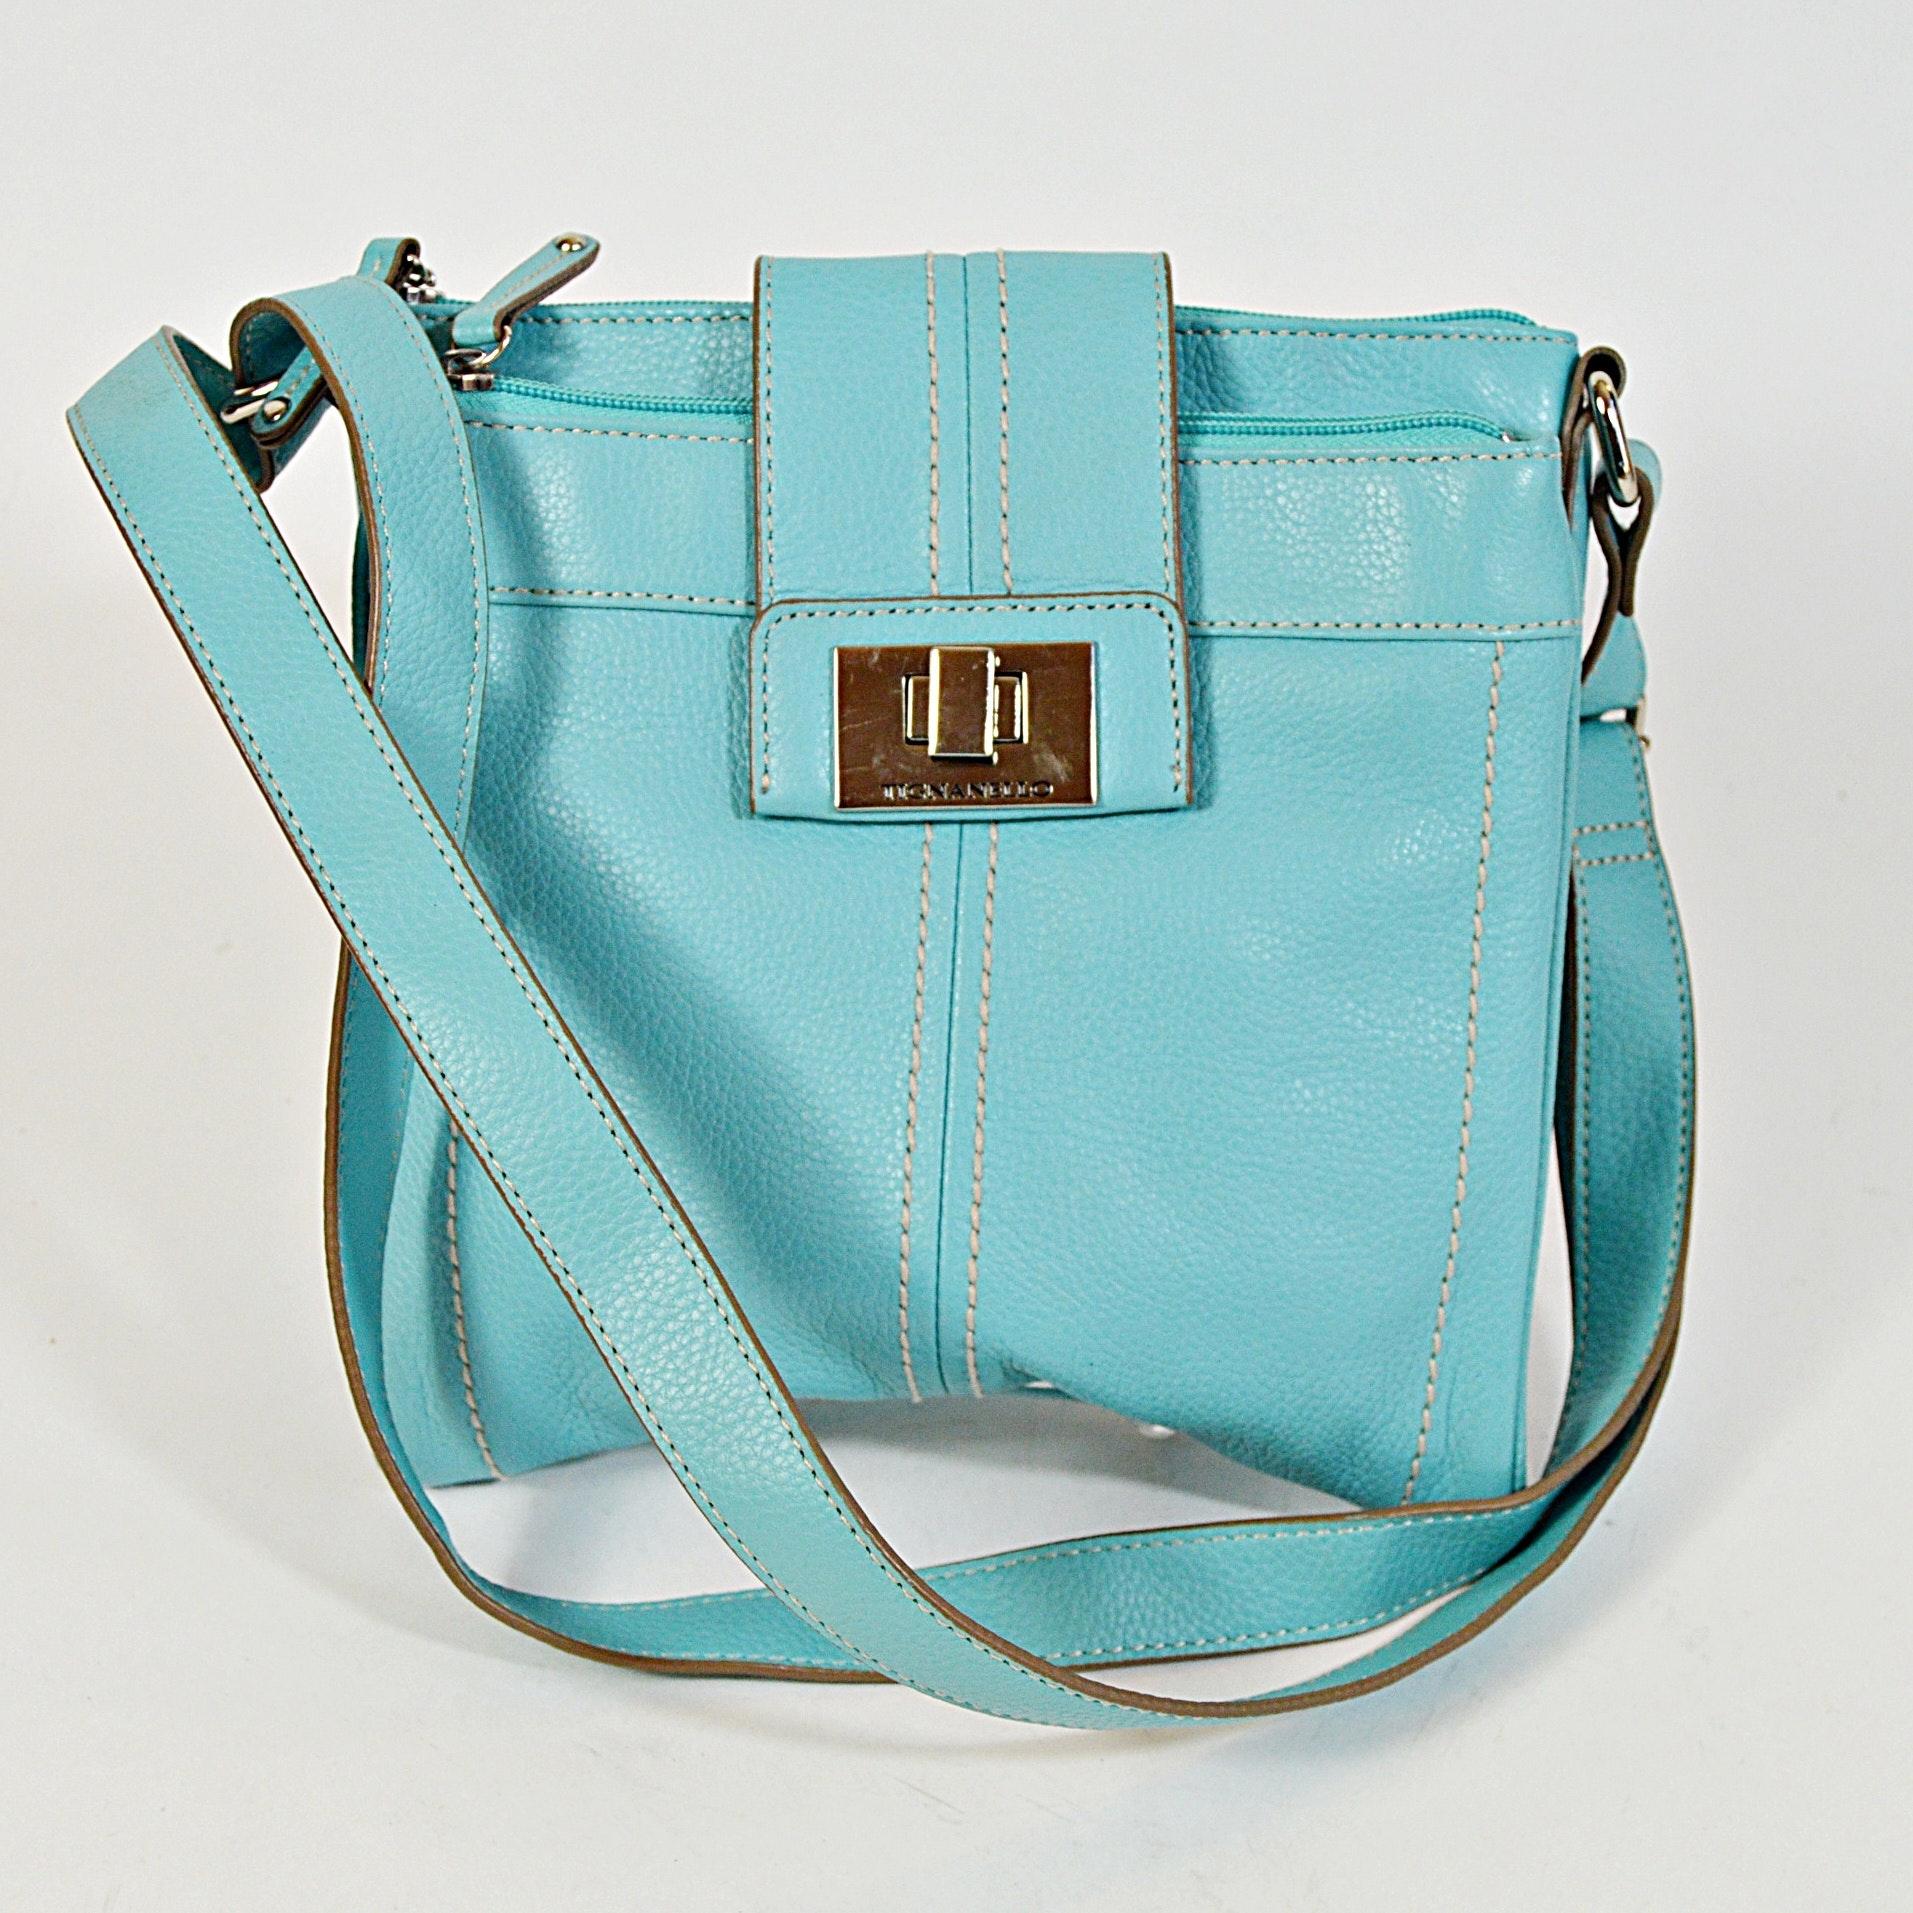 Tignanello Aqua Blue Leather Handbag